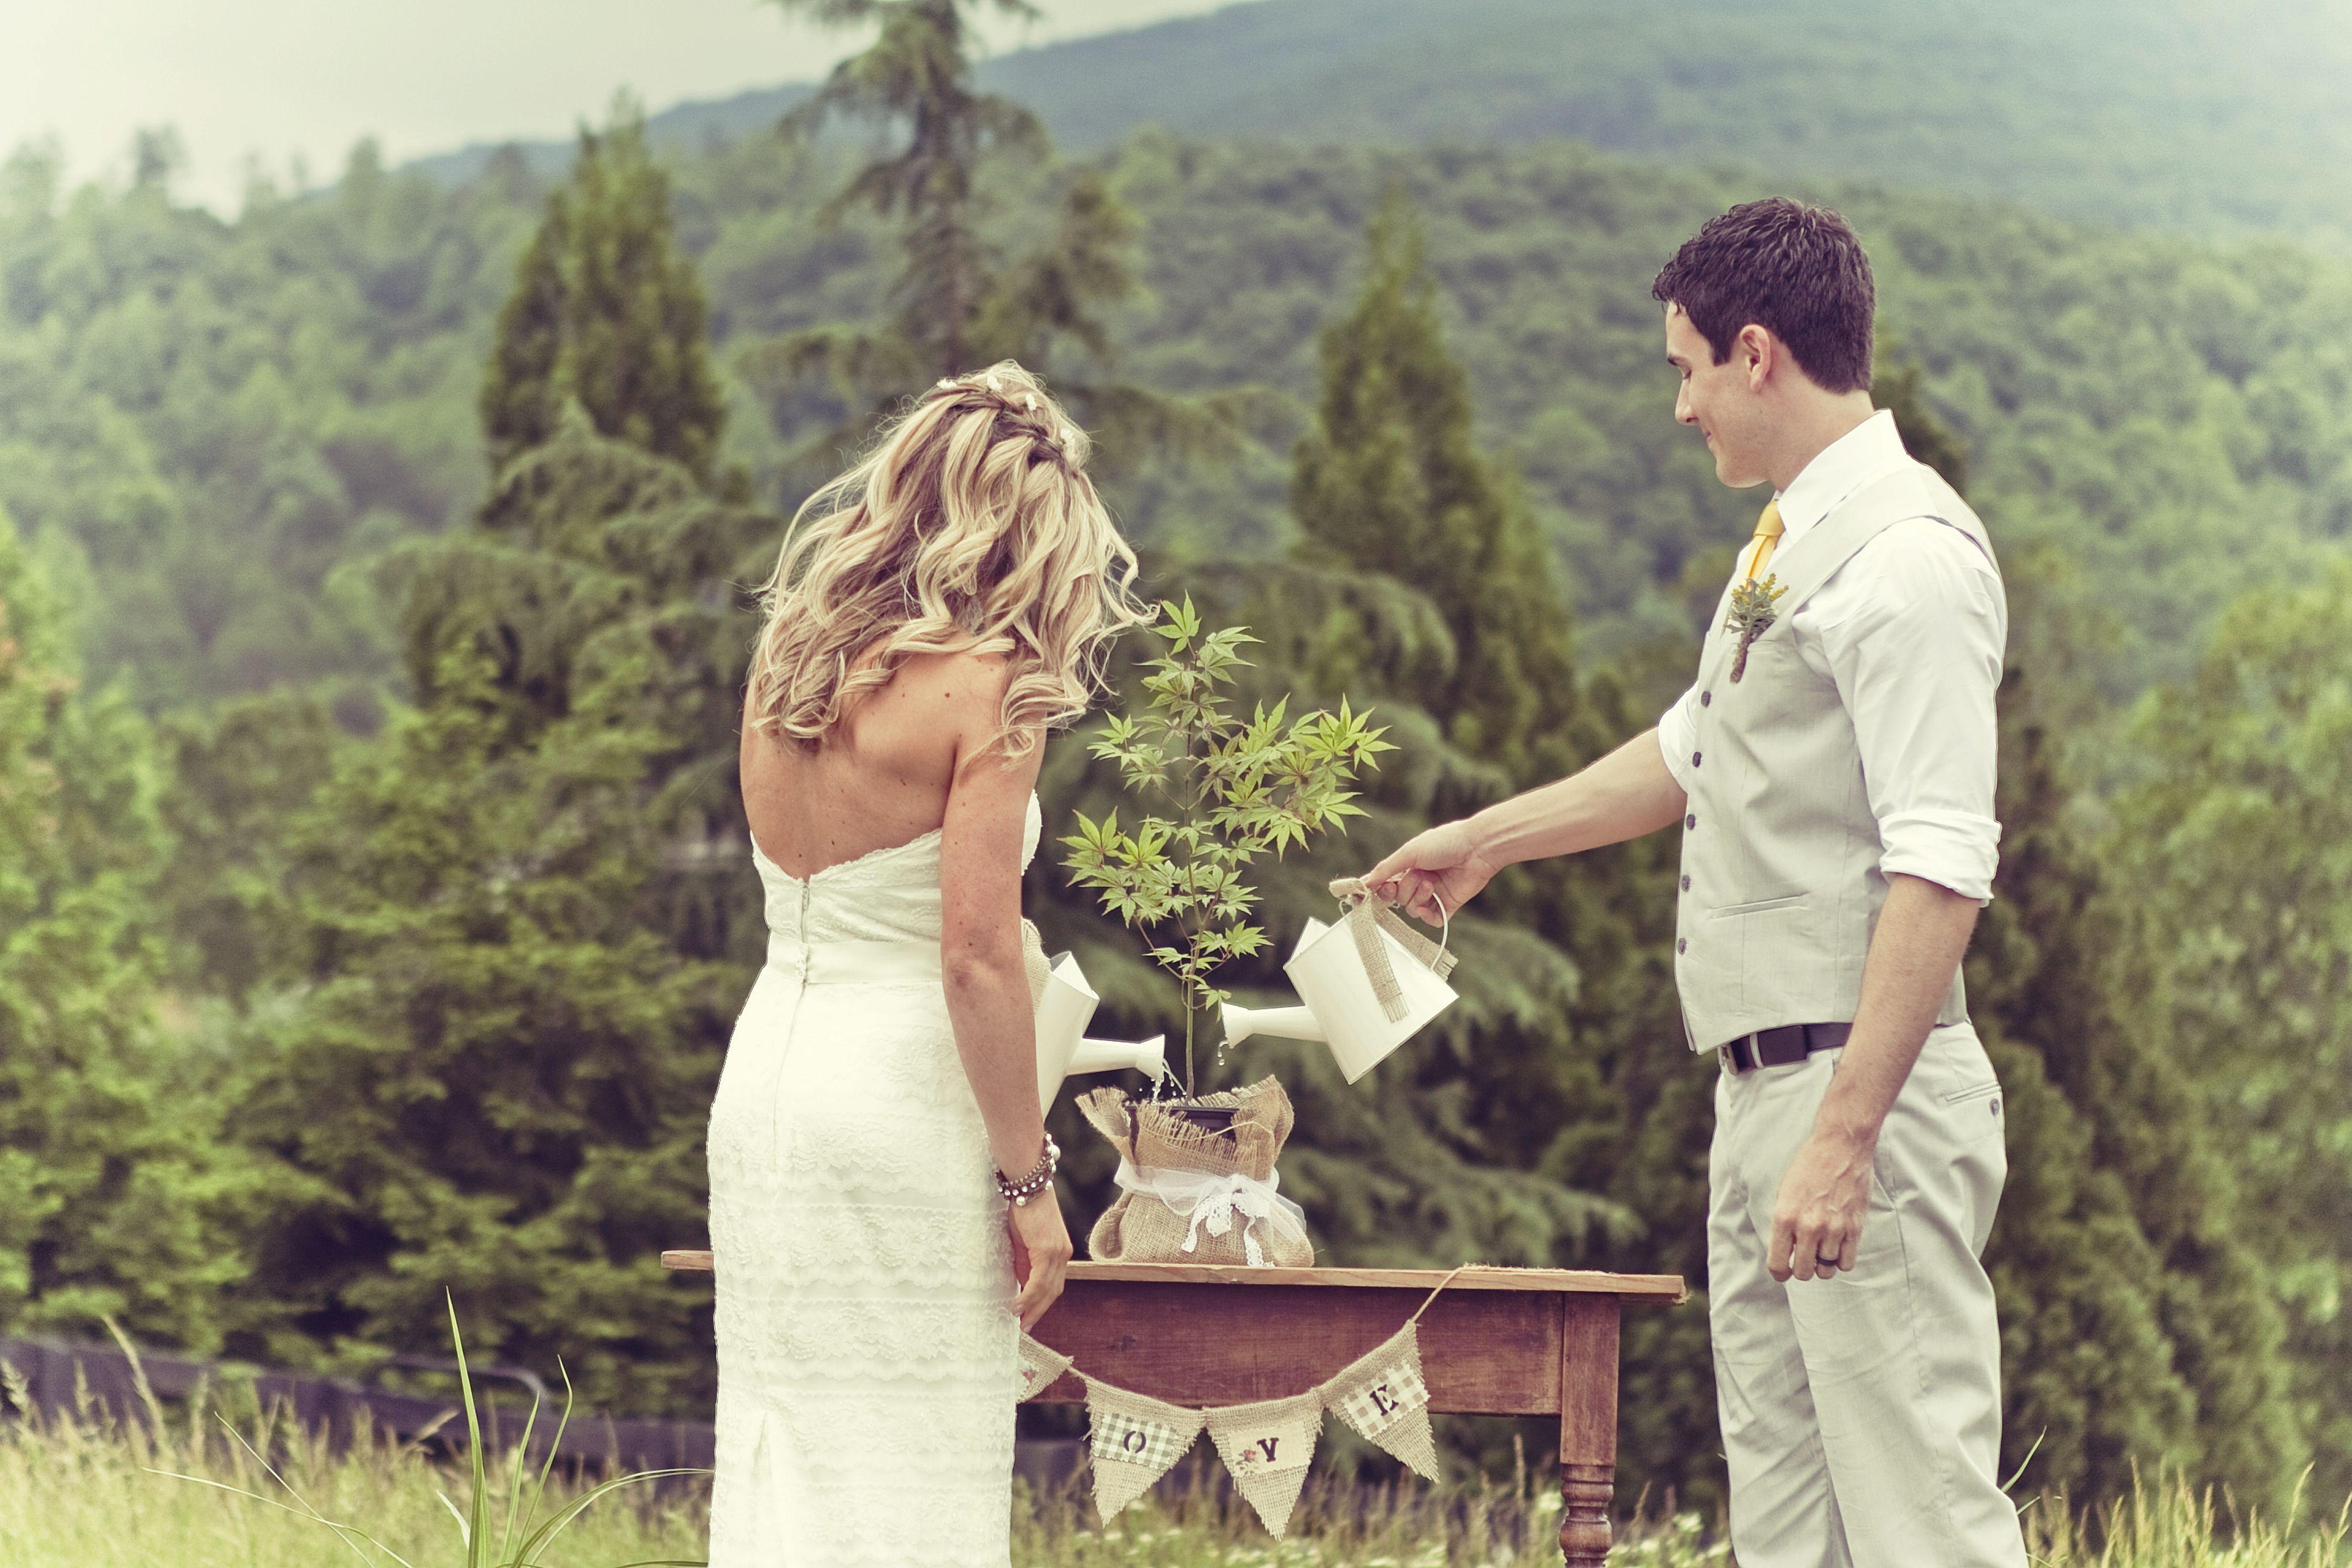 outdoor-rustic-wedding-ceremony